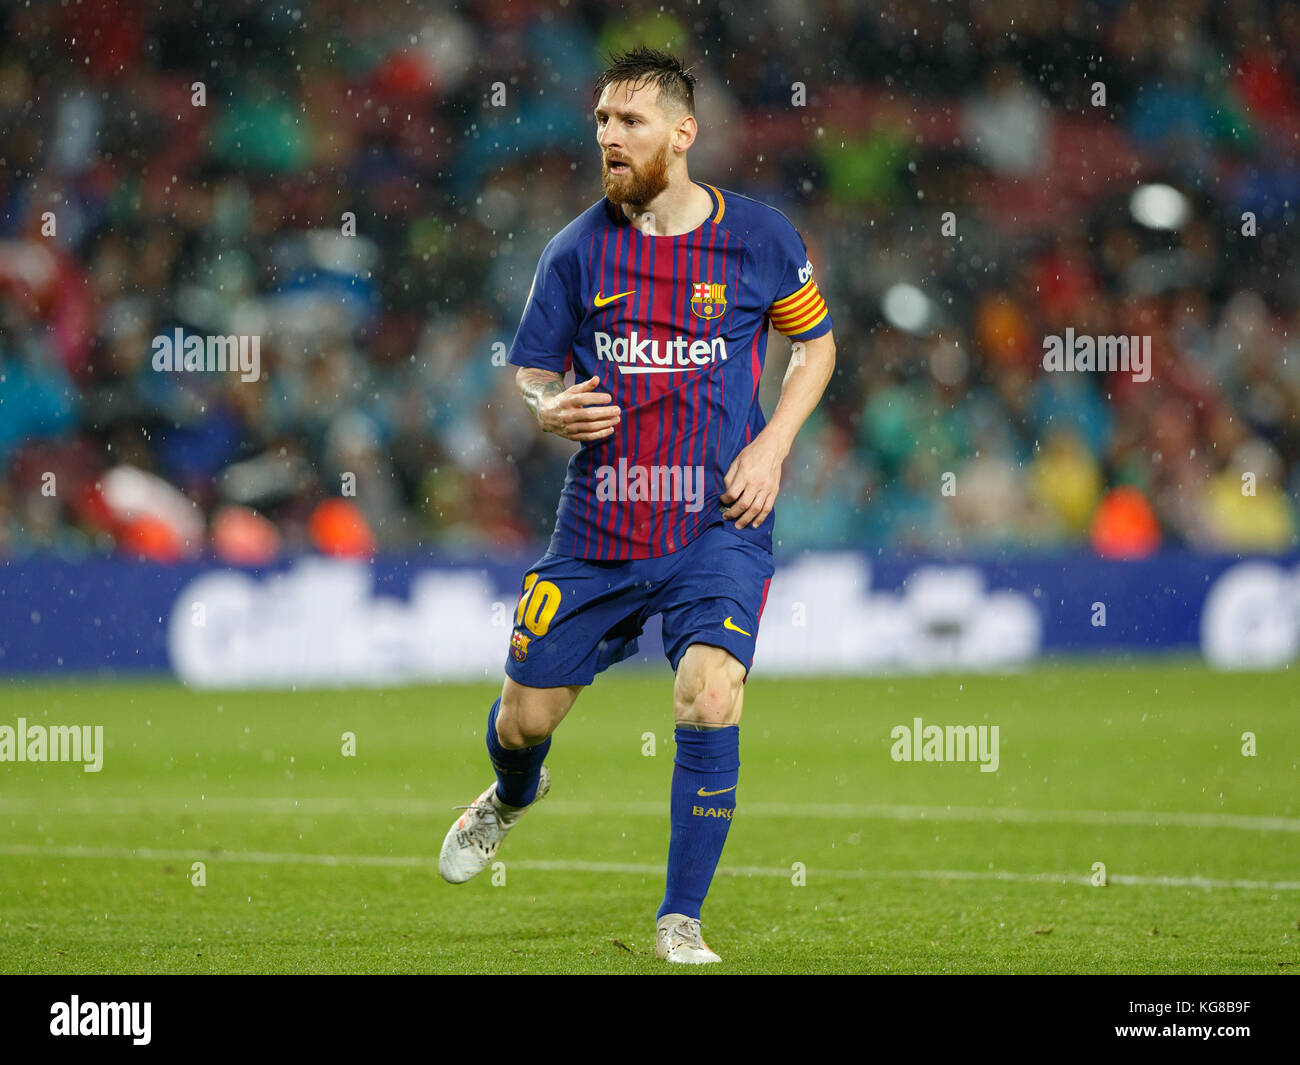 Barcelona, Spain. 4th November, 2017. Match between FC Barcelona and Sevilla FC in Camp Nou stadium. Leo Messi Credit: - Stock Image